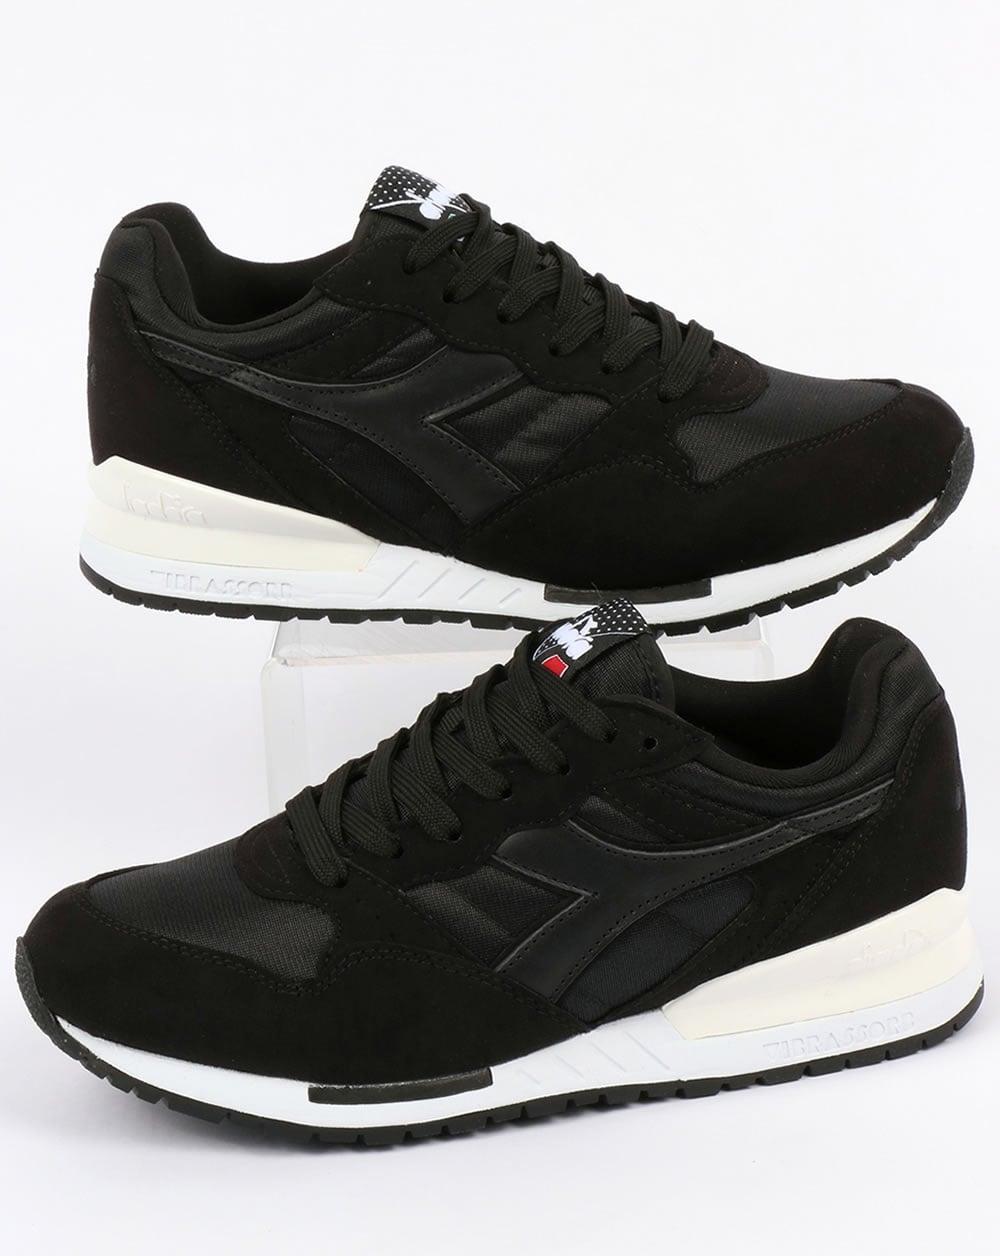 Scrutinio Prospettiva Persistente  Diadora Intrepid NYL Trainers Black,og,runners,shoes,mens